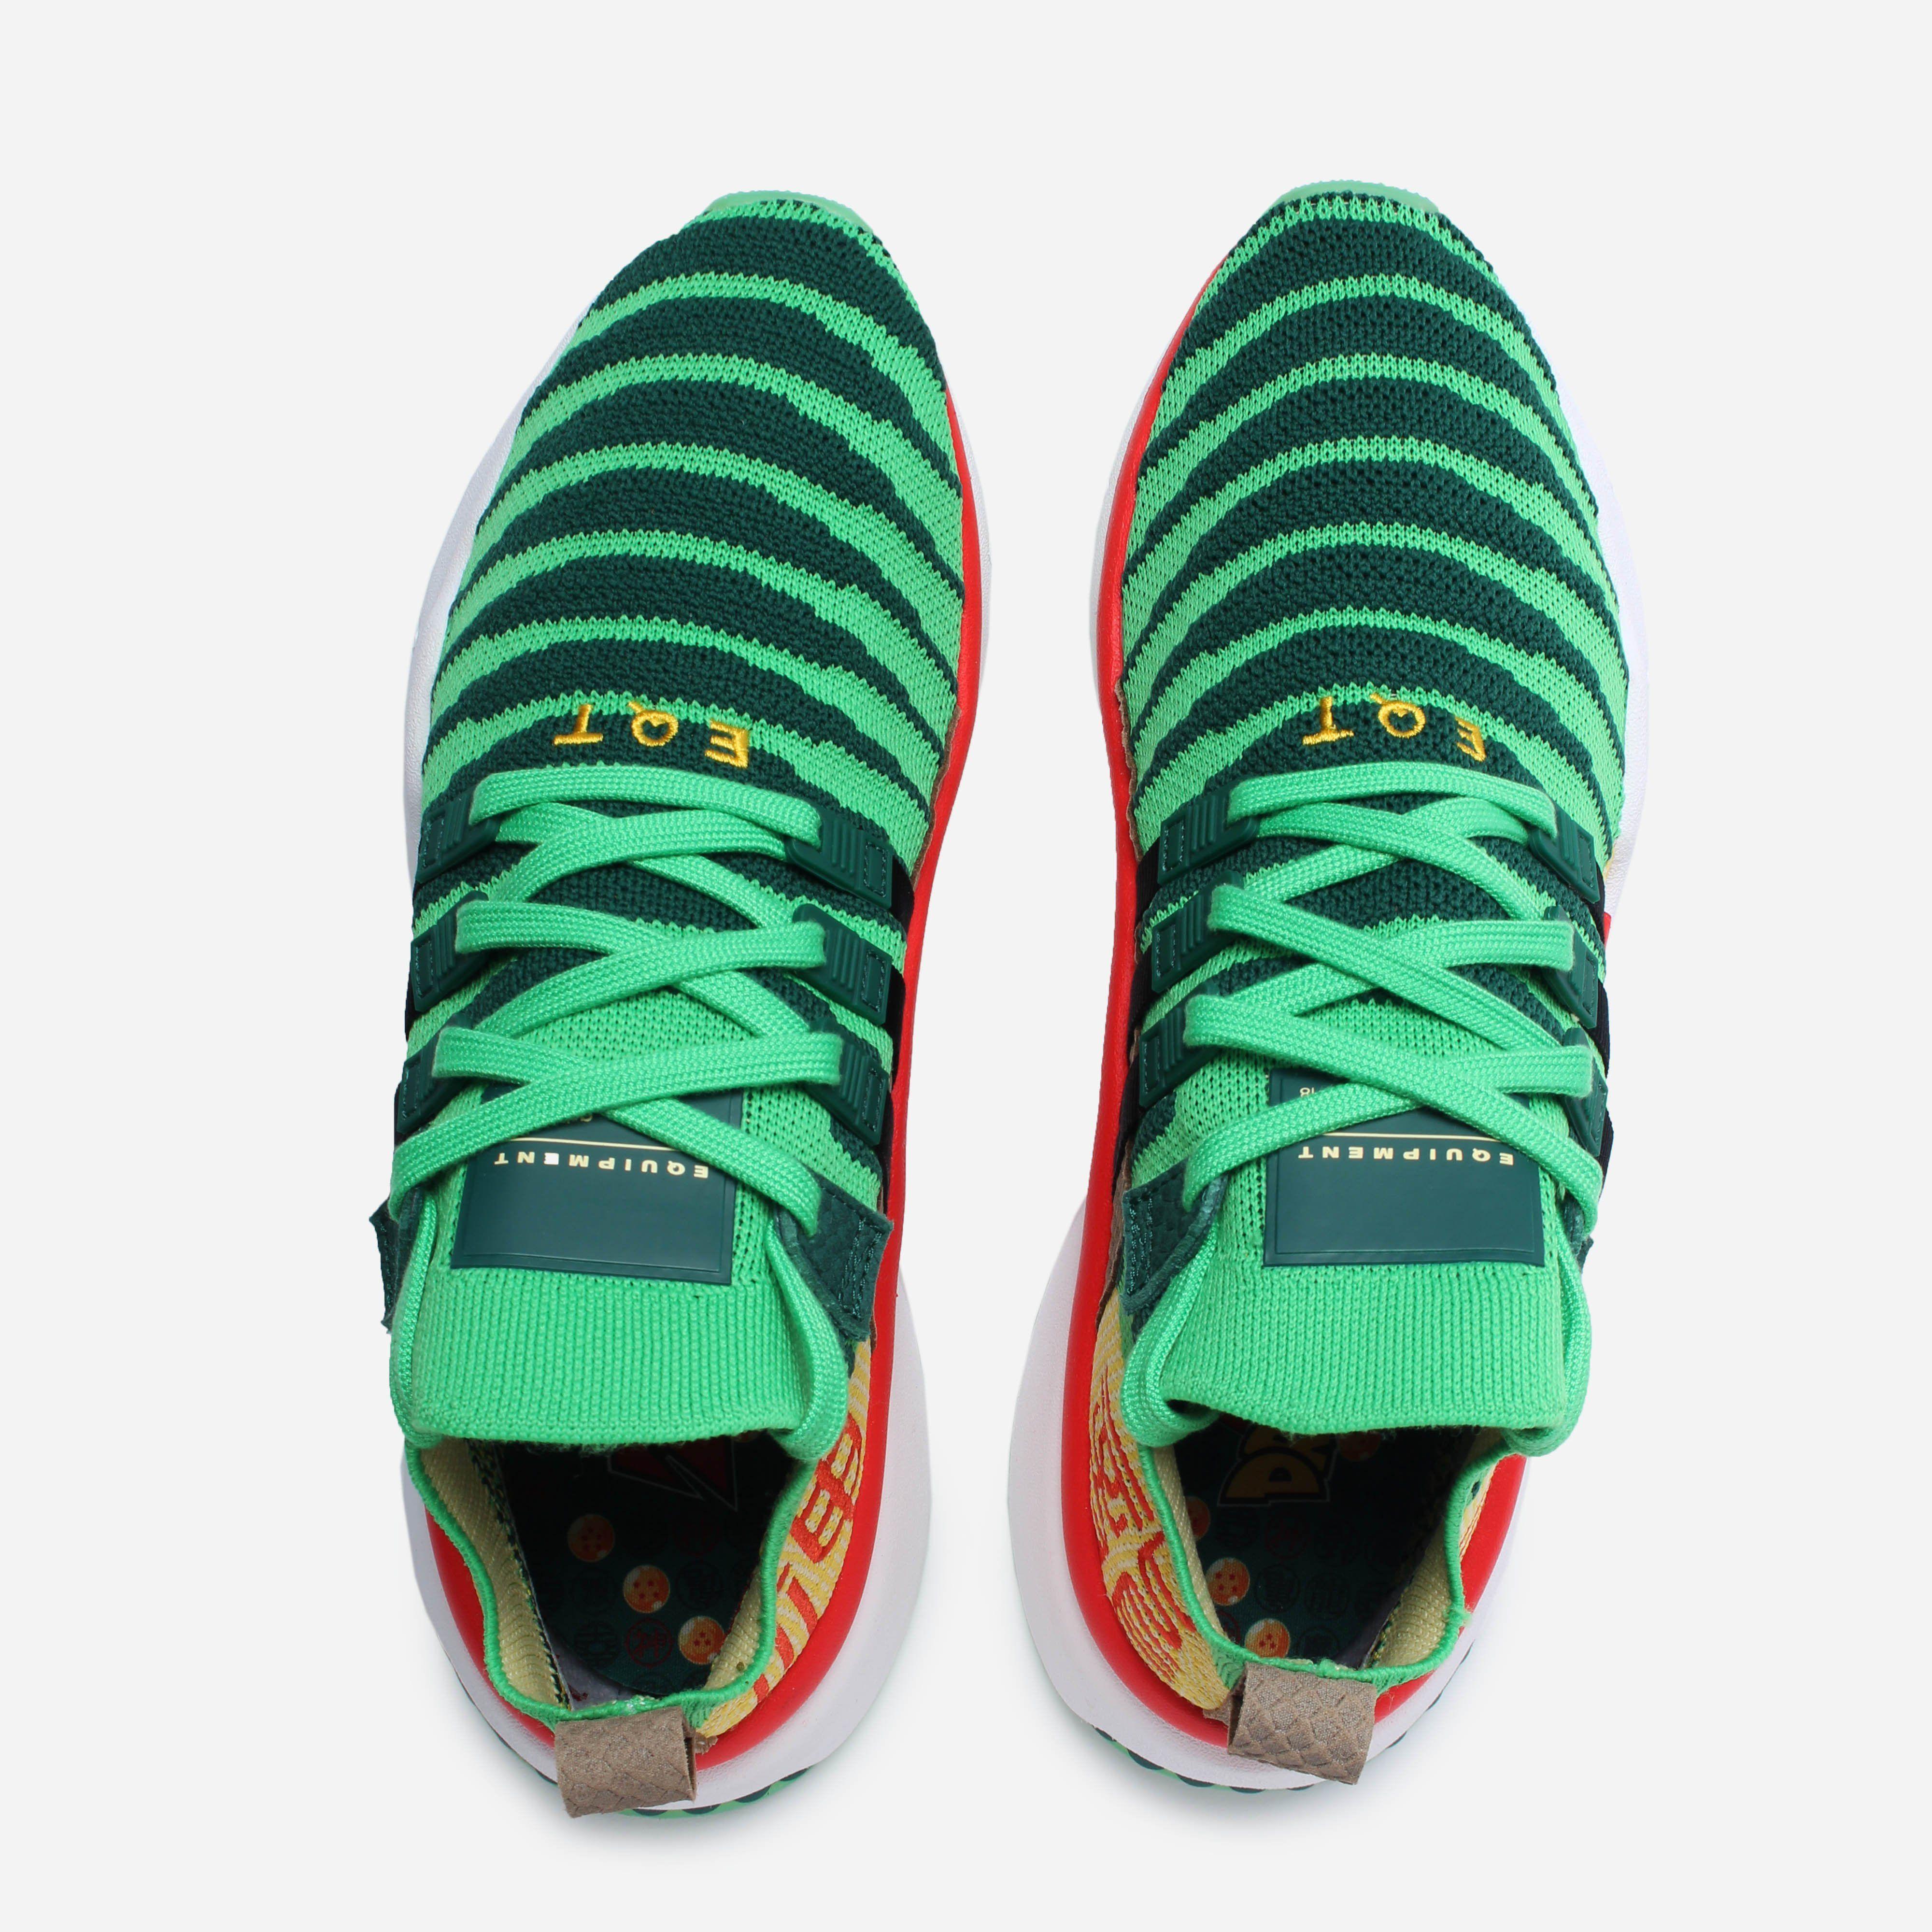 adidas Originals x Dragon Ball Z 'Shenron' EQT